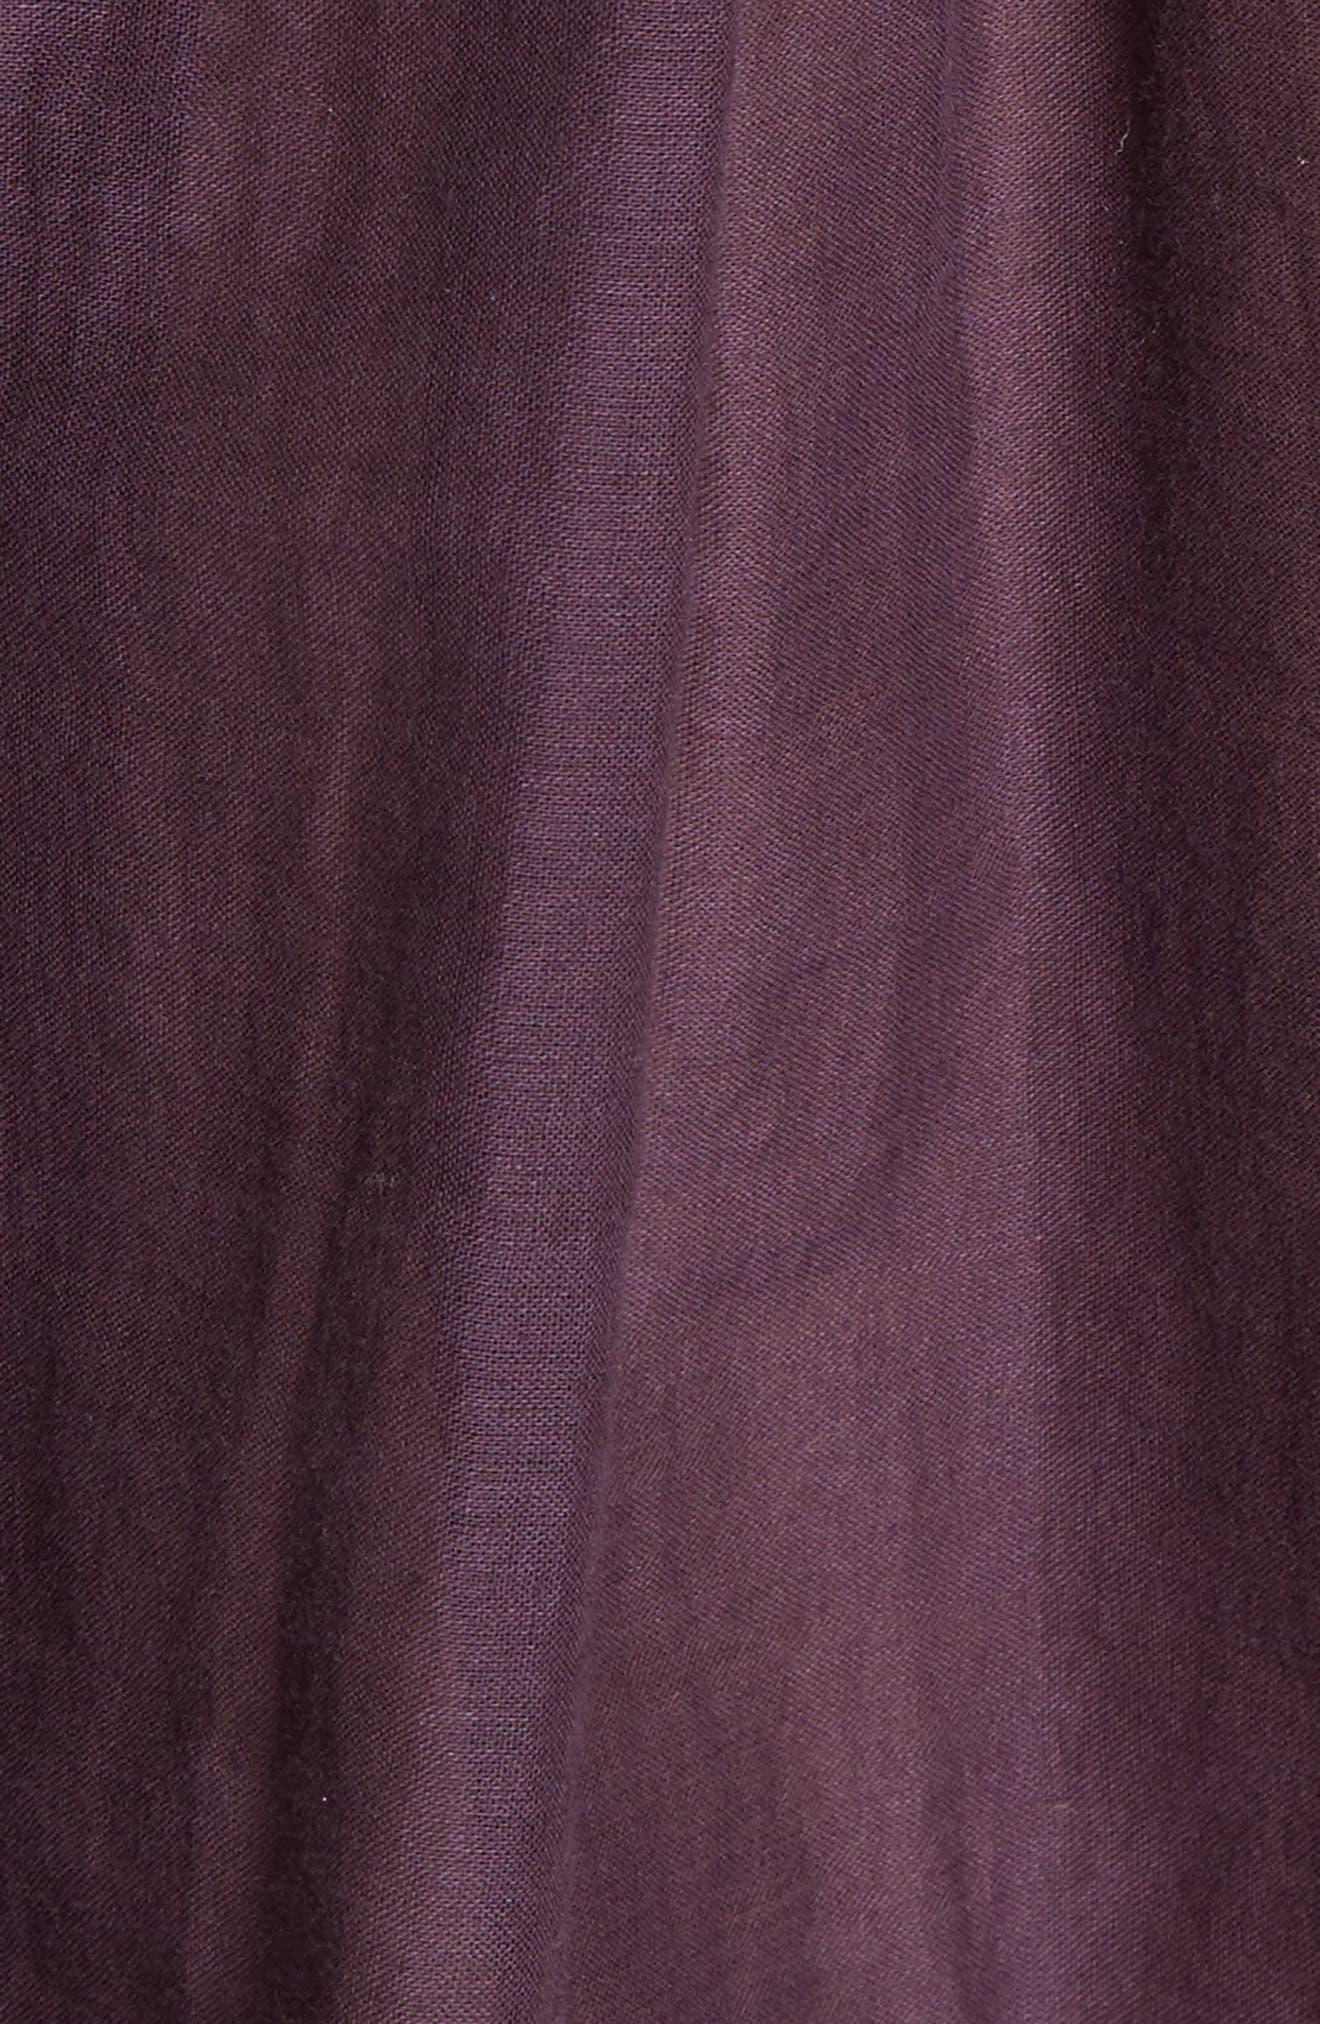 Shimla Embroidered Blouse,                             Alternate thumbnail 9, color,